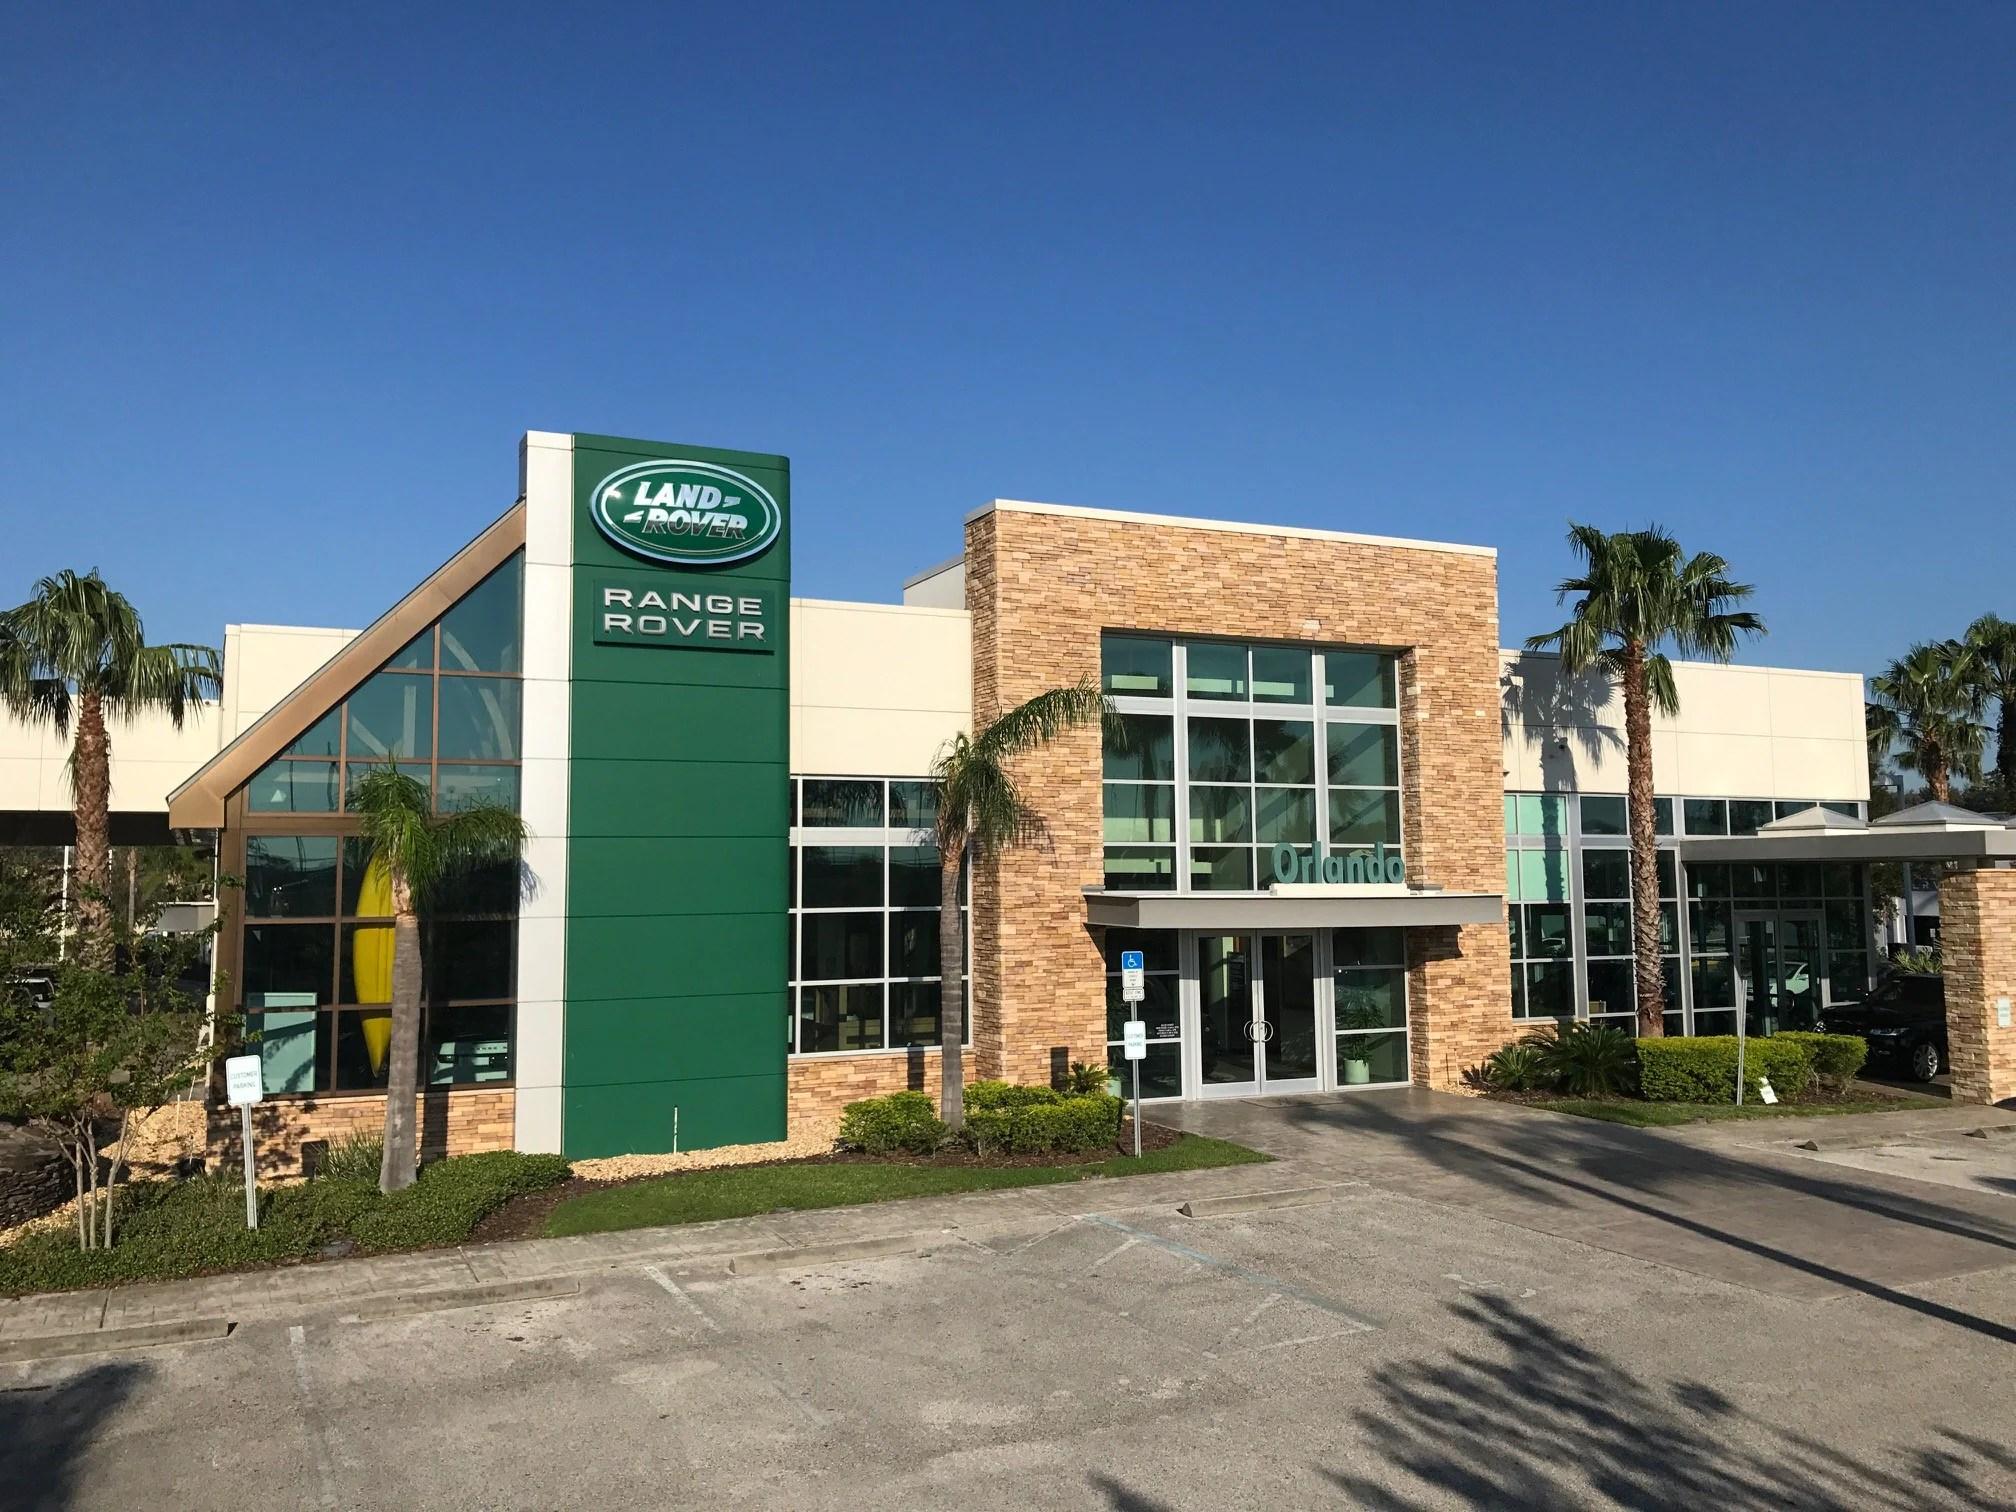 The Land Rover Orlando Story